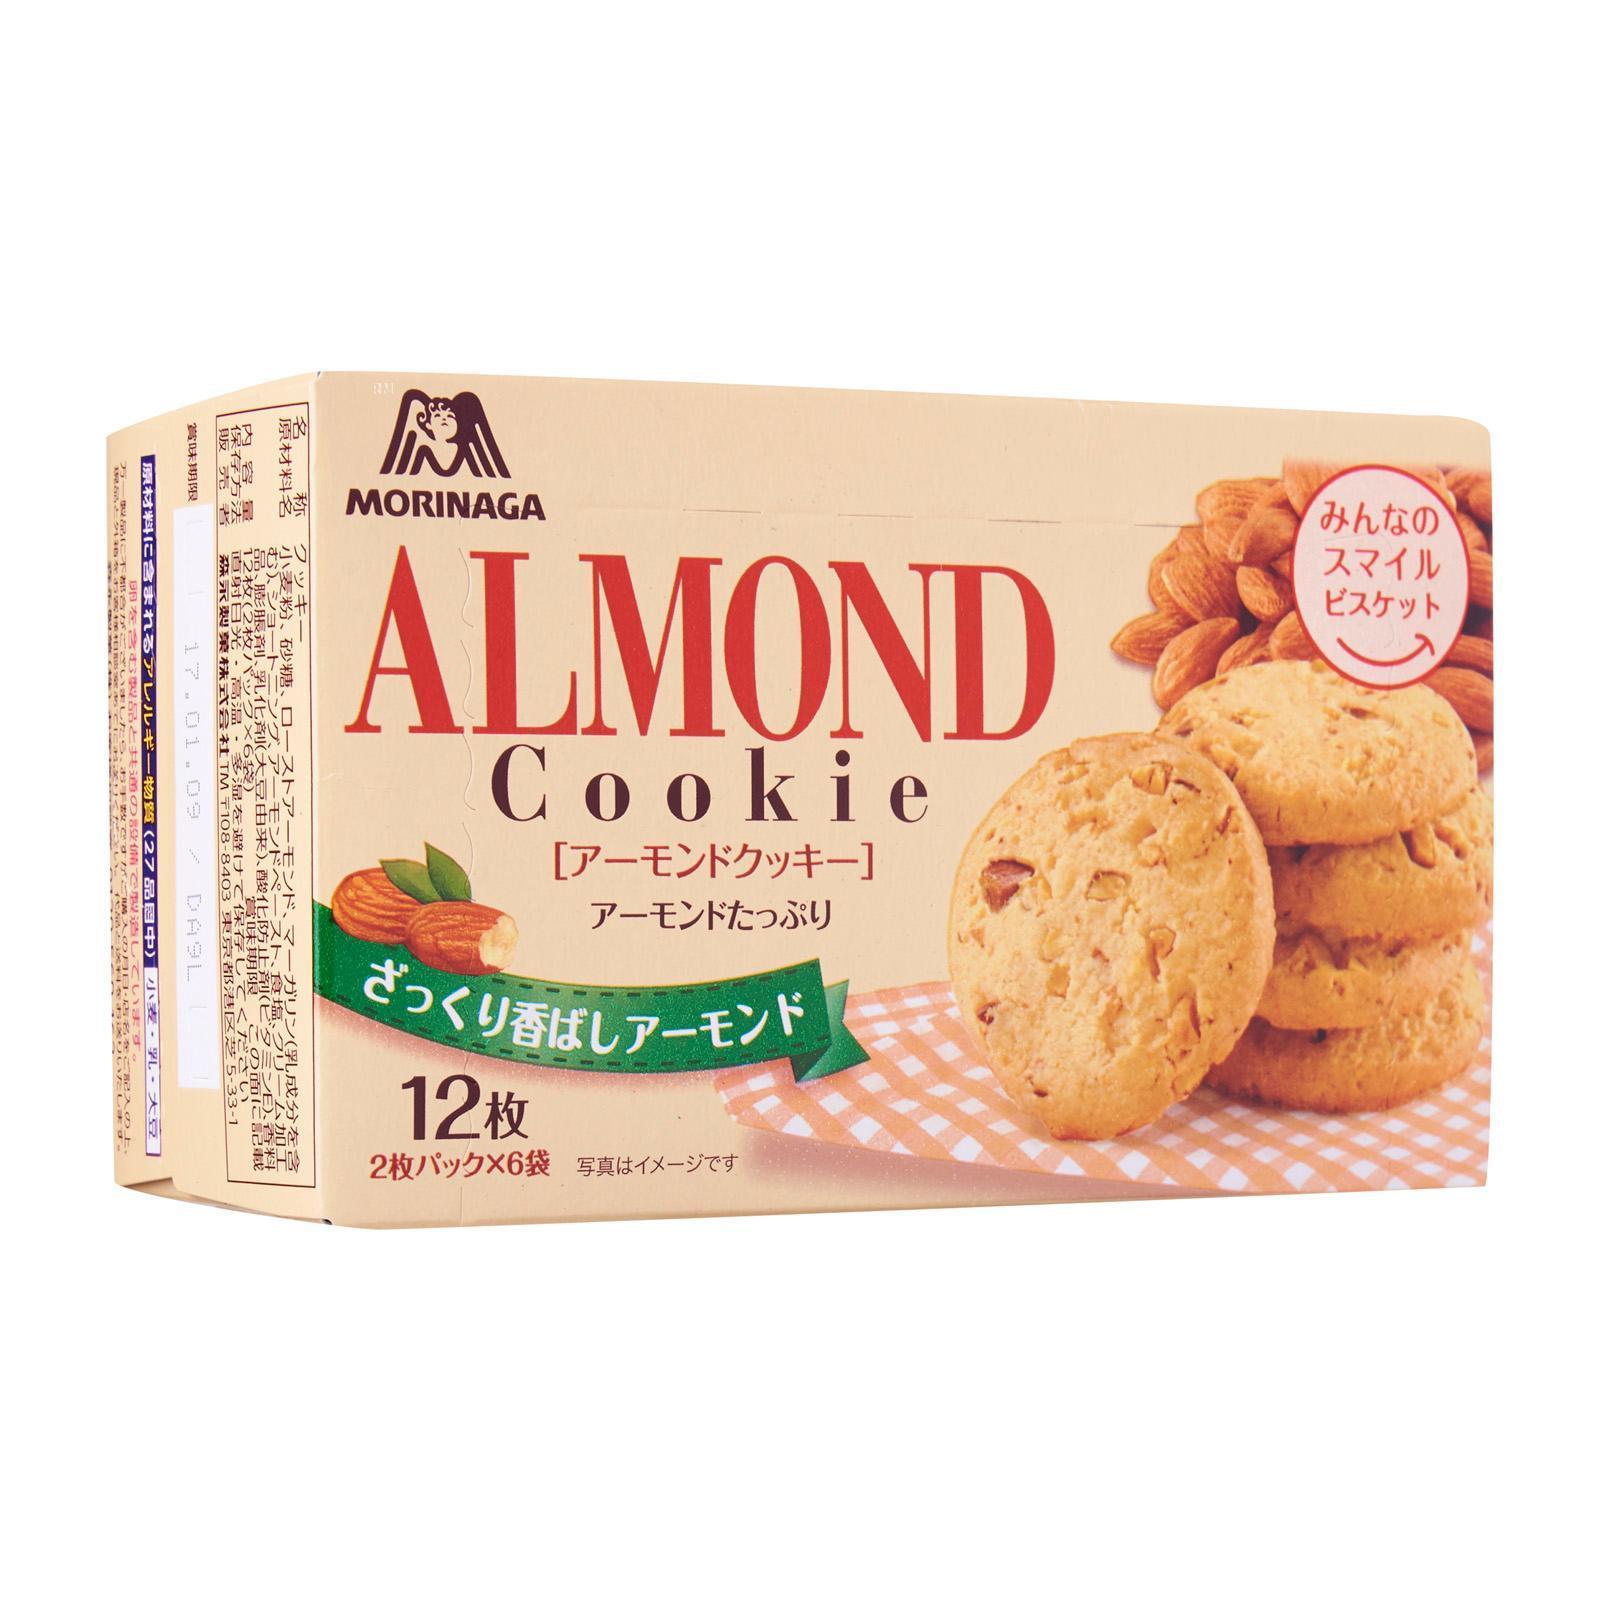 Morinaga Almond Cookies - Jetro Special